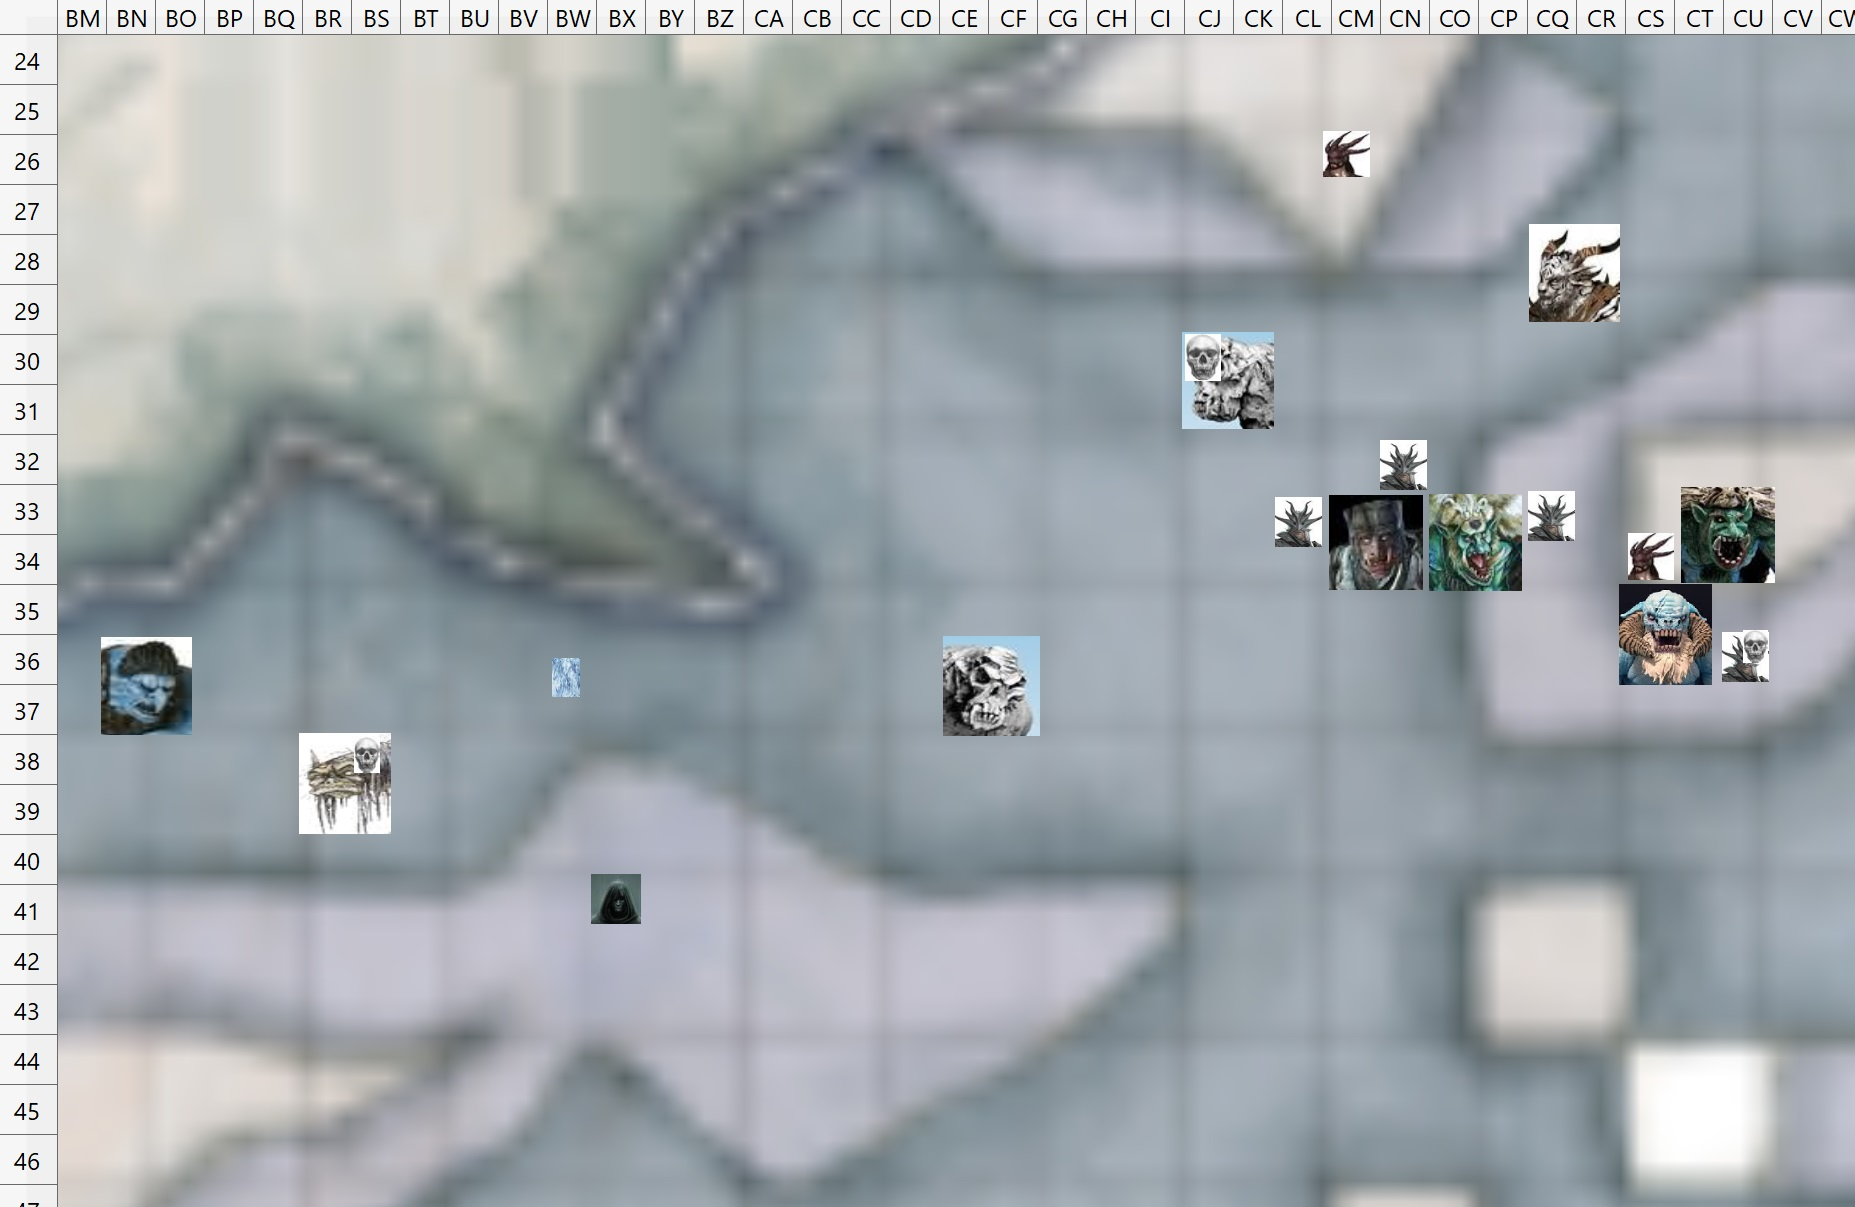 IceLairE10.jpg